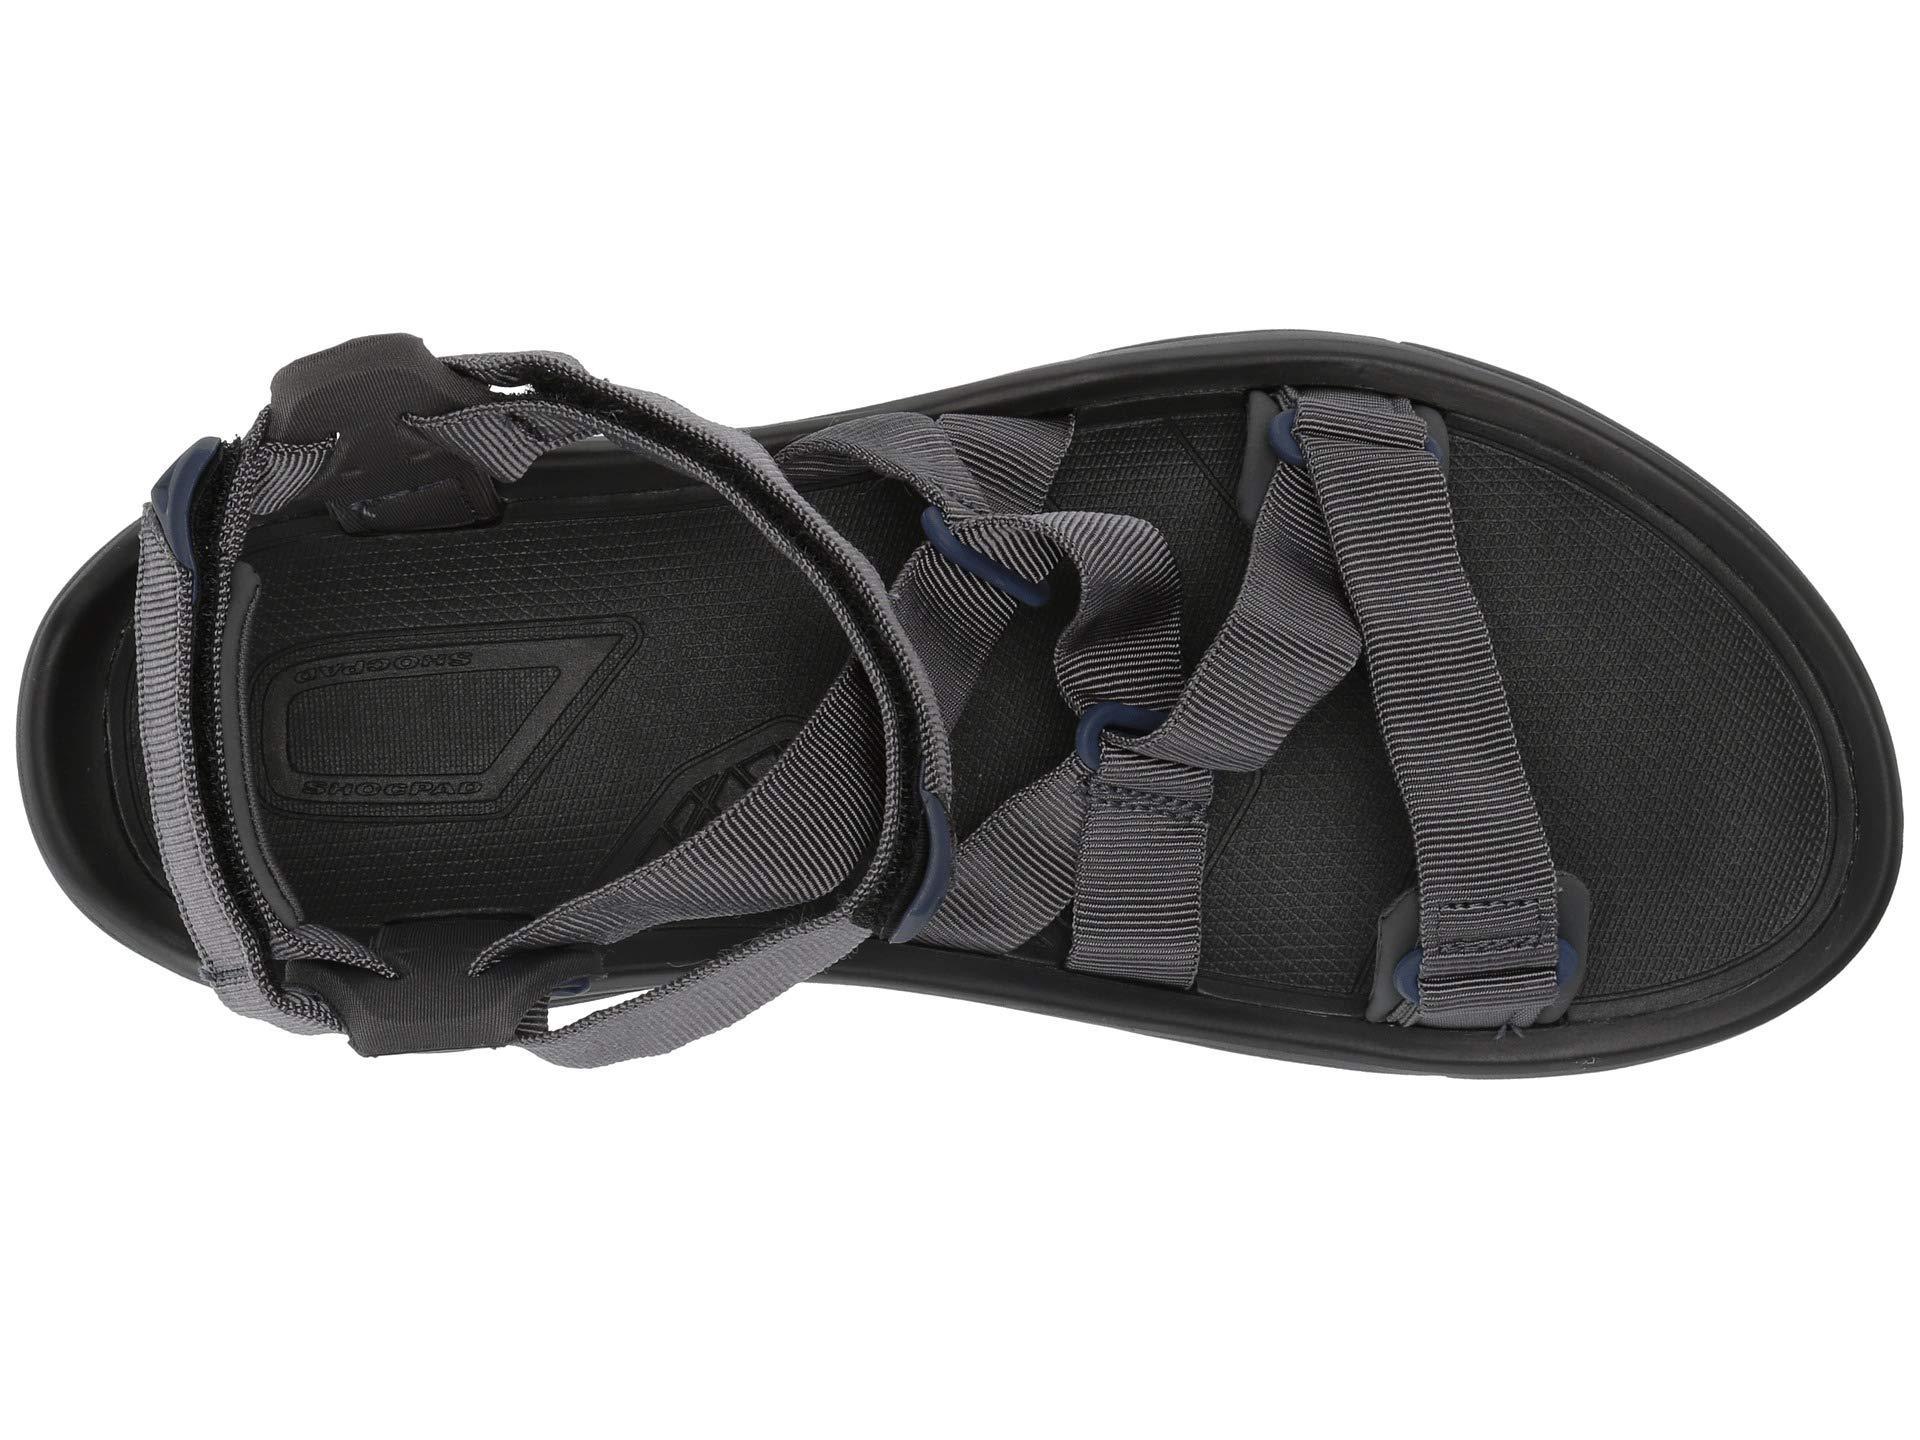 bbf28dee4e6cdd Teva - Multicolor Terra Fi 5 Sport (black) Men s Shoes for Men - Lyst. View  fullscreen